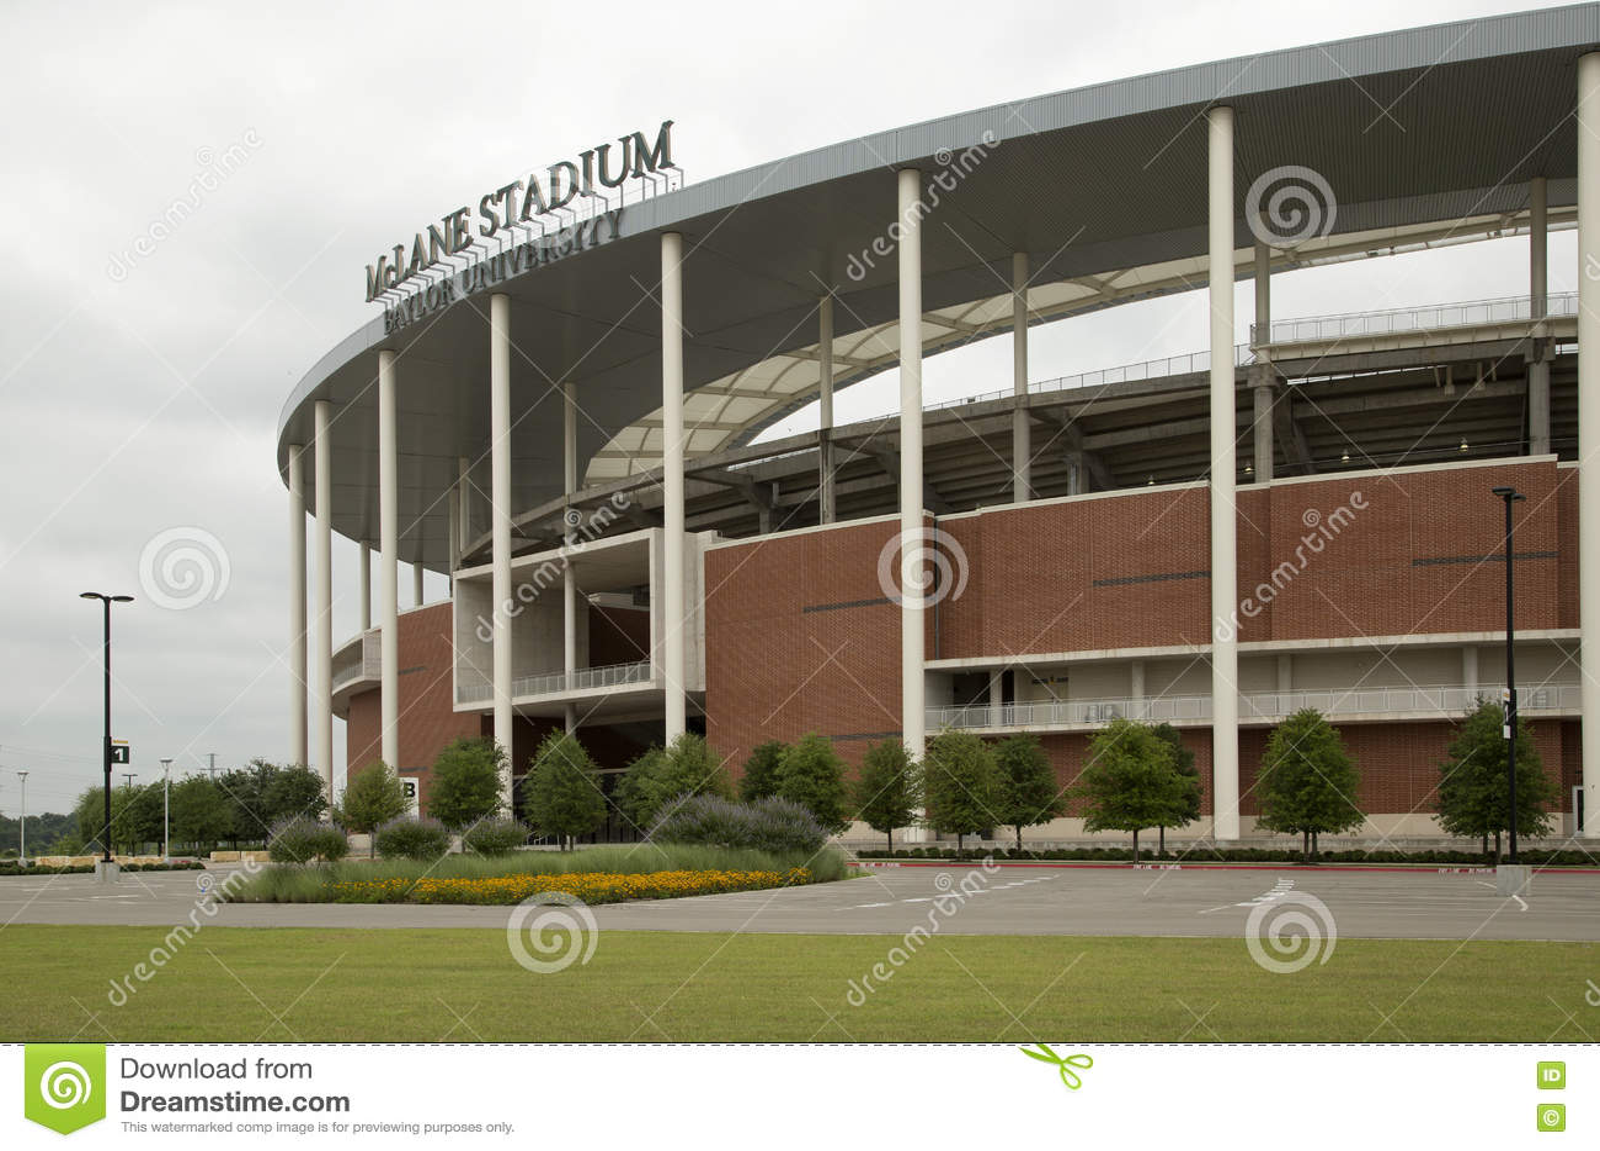 Trevlig McLane stadion